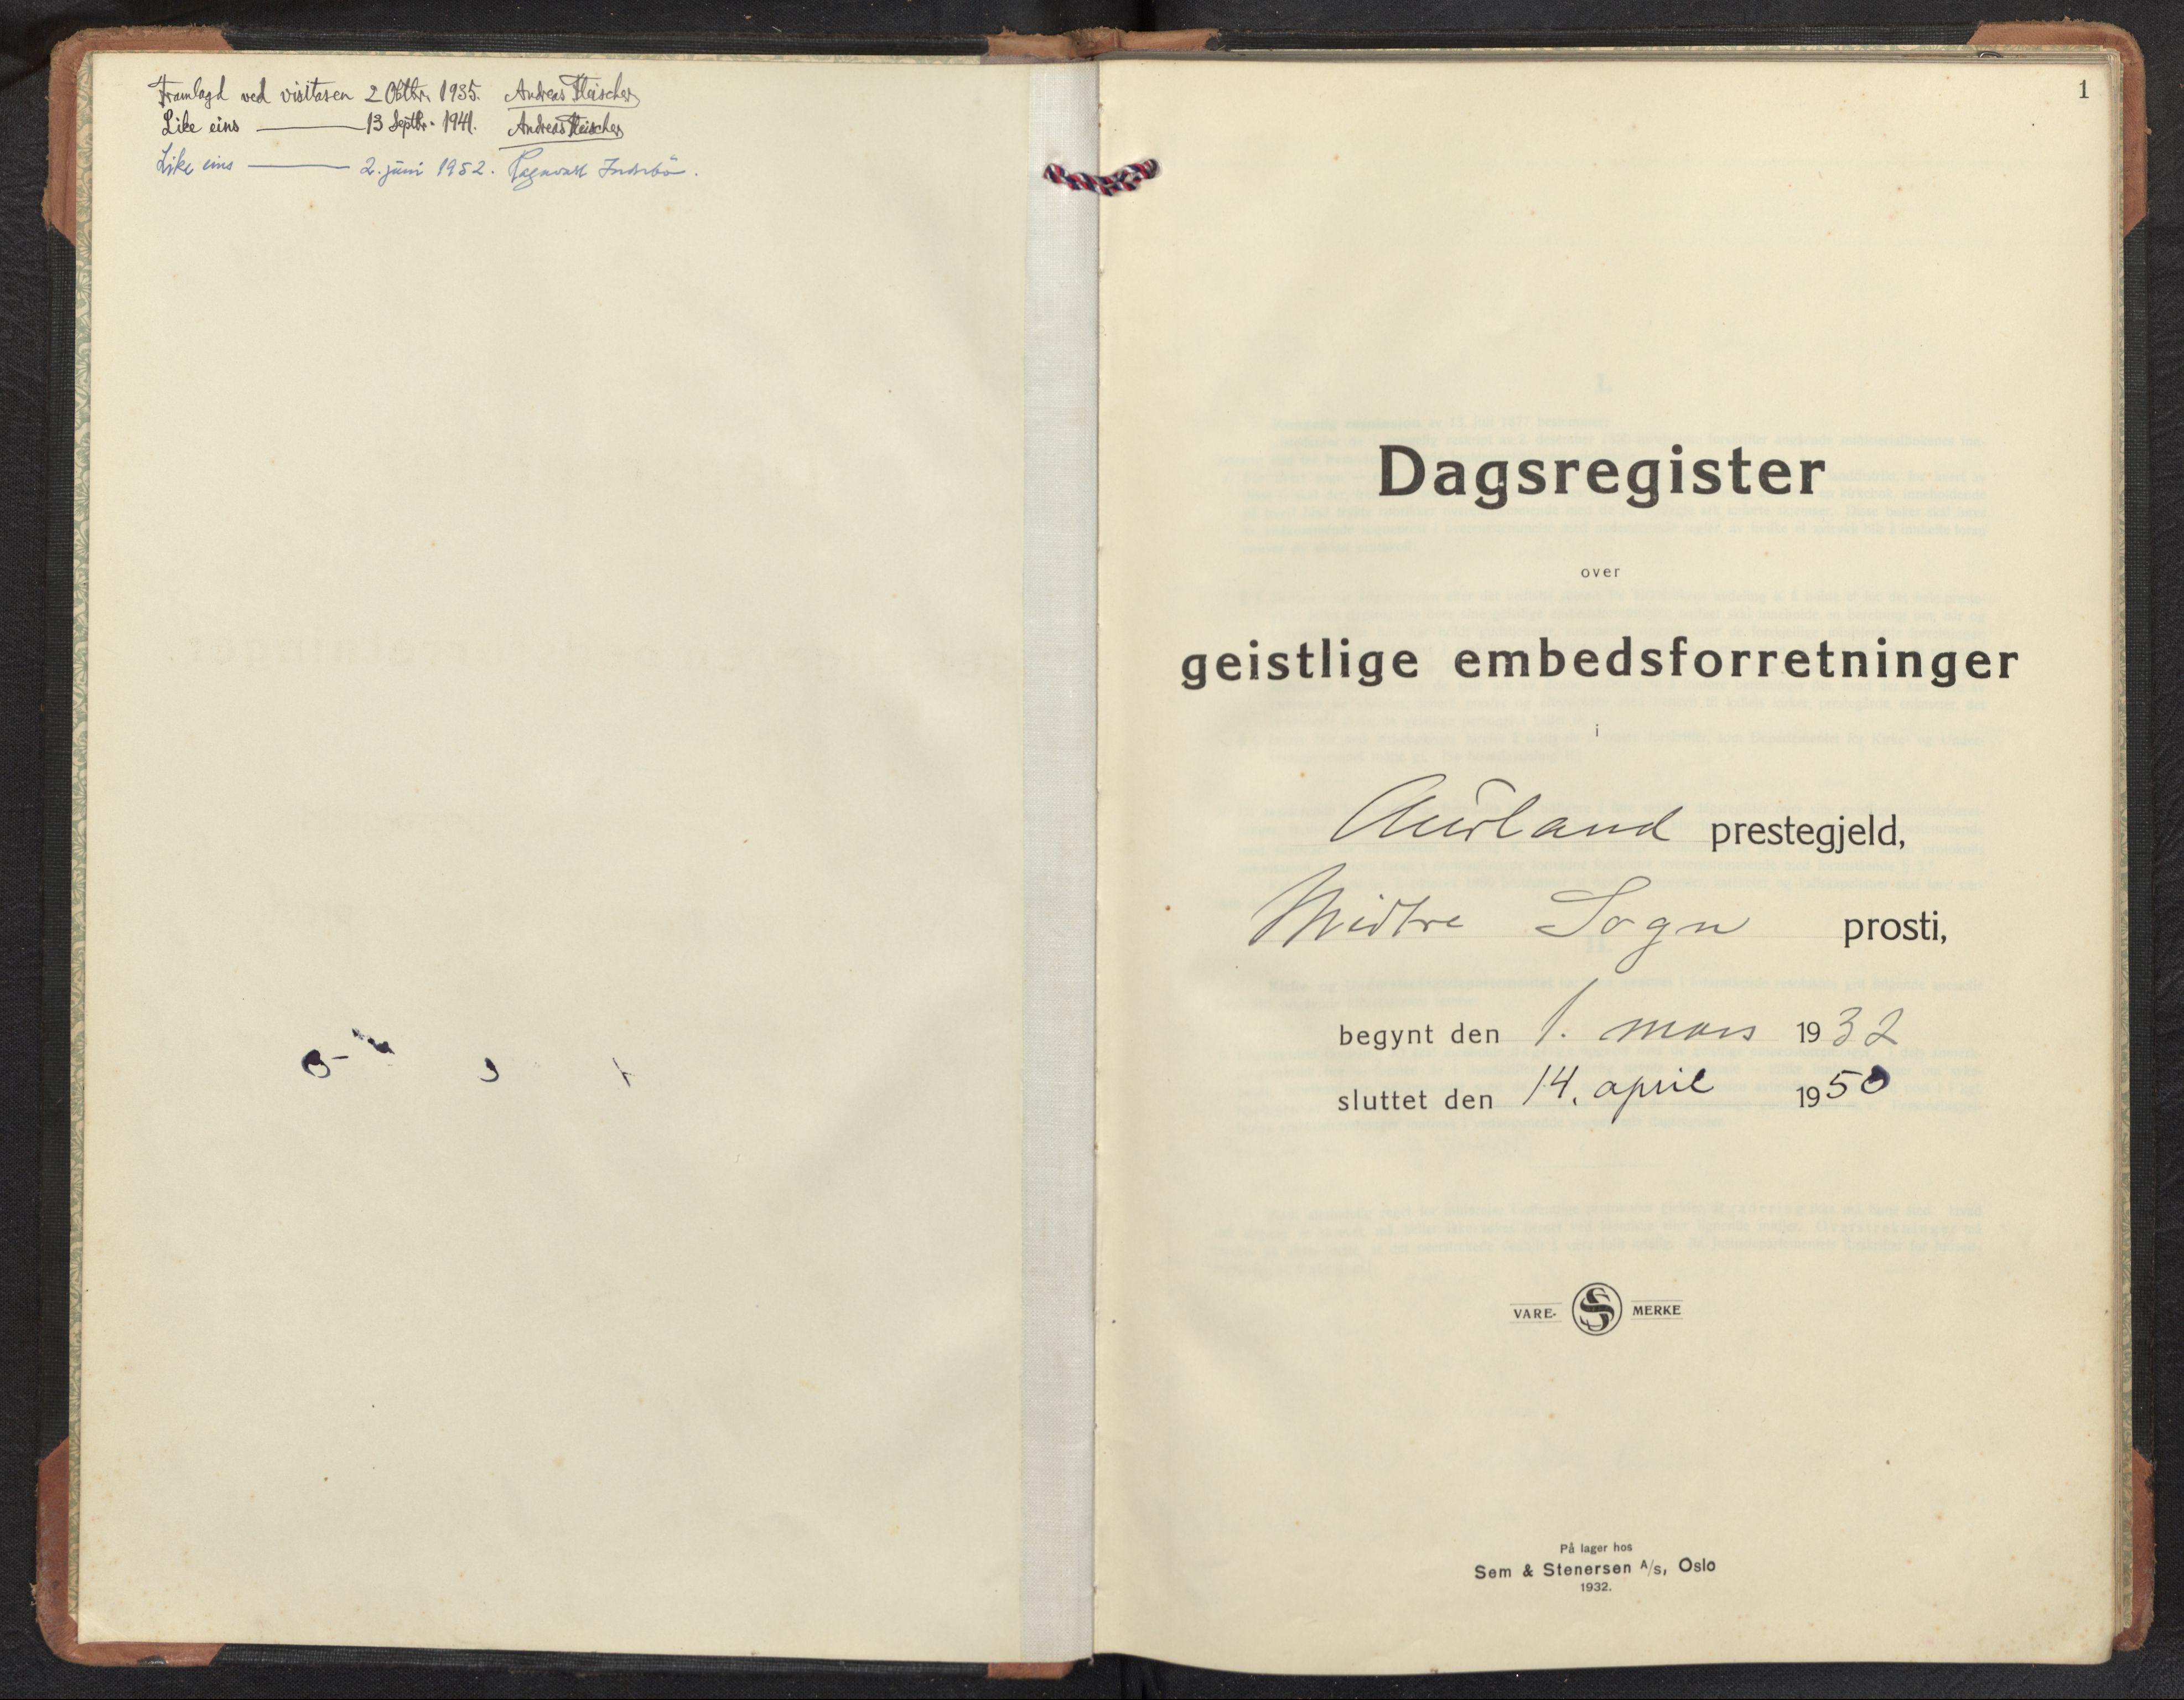 SAB, Aurland Sokneprestembete*, Dagregister nr. F 3, 1932-1950, s. 0b-1a